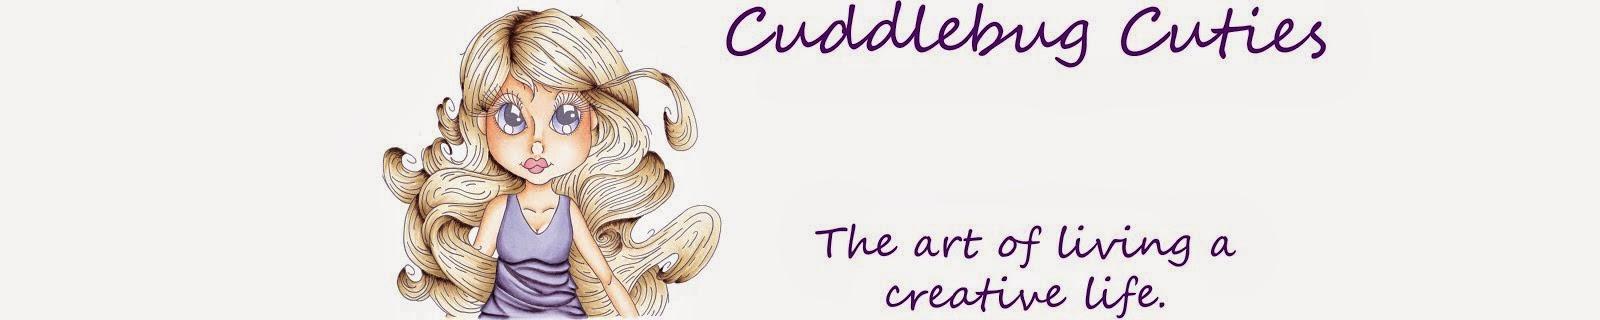 Cuddlebug Cuties